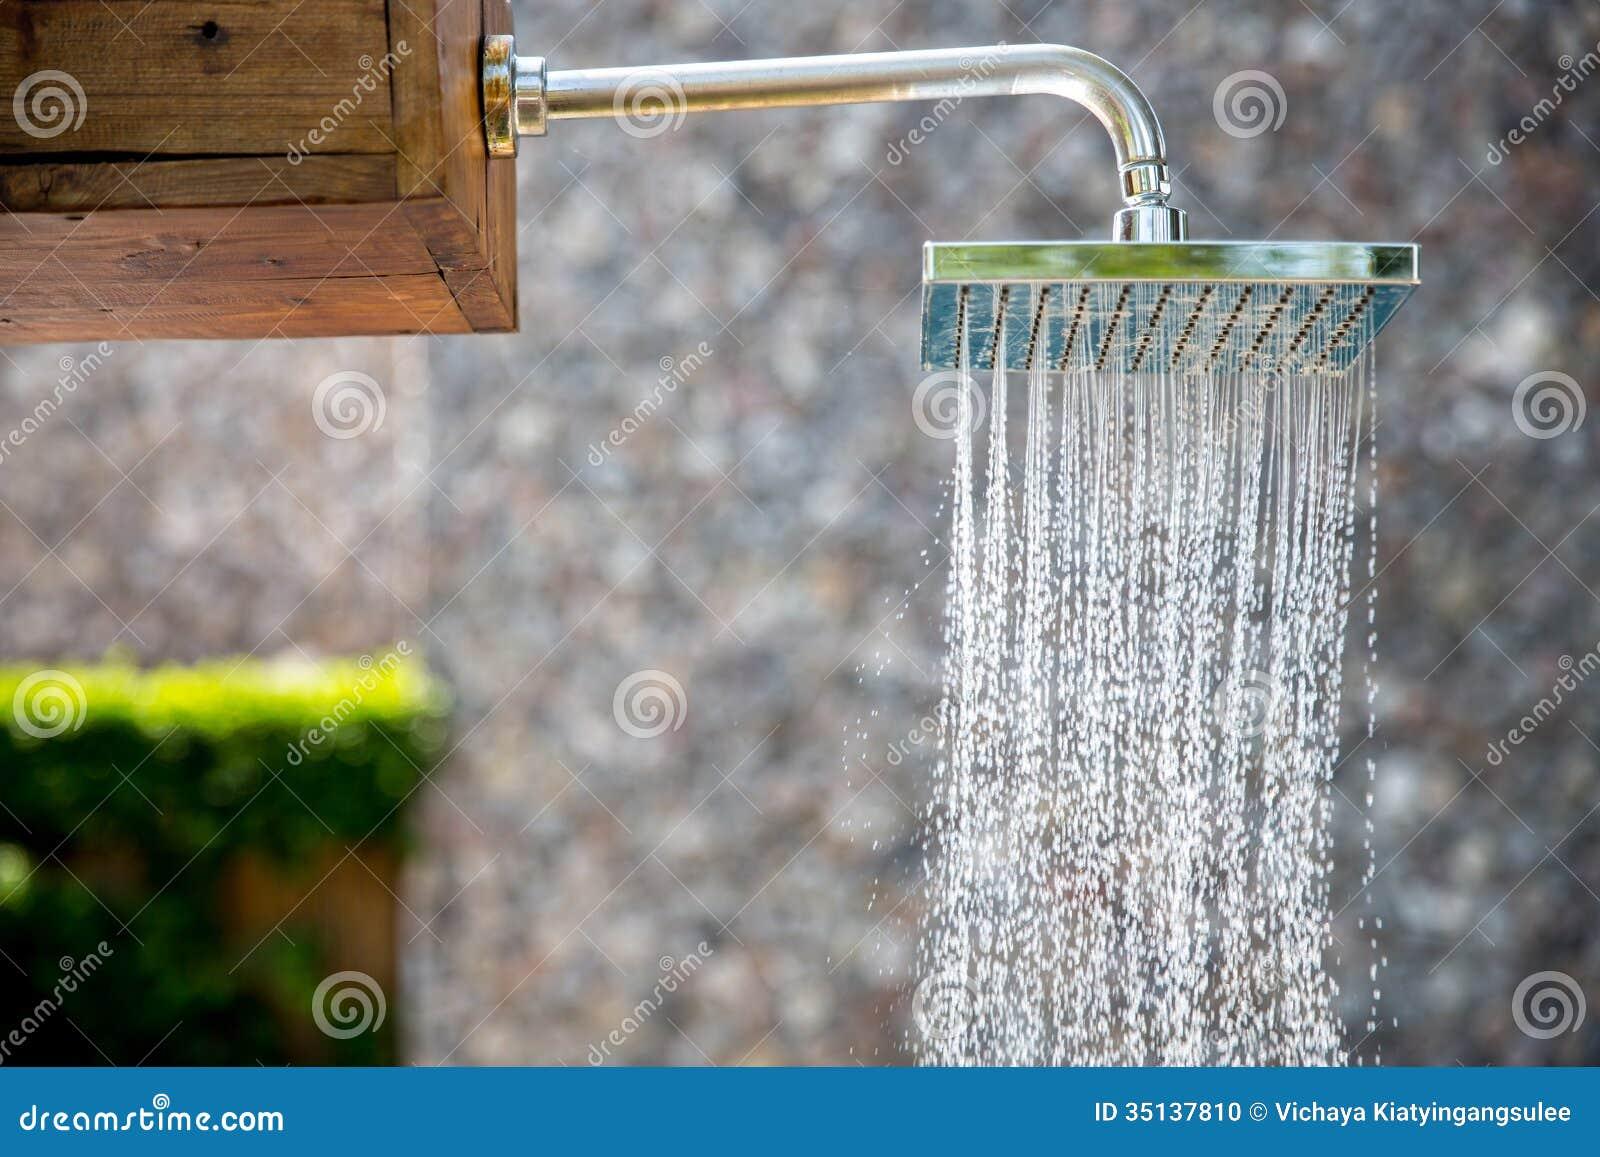 Ducha de lluvia al aire libre foto de archivo imagen de for Ducha lluvia precio